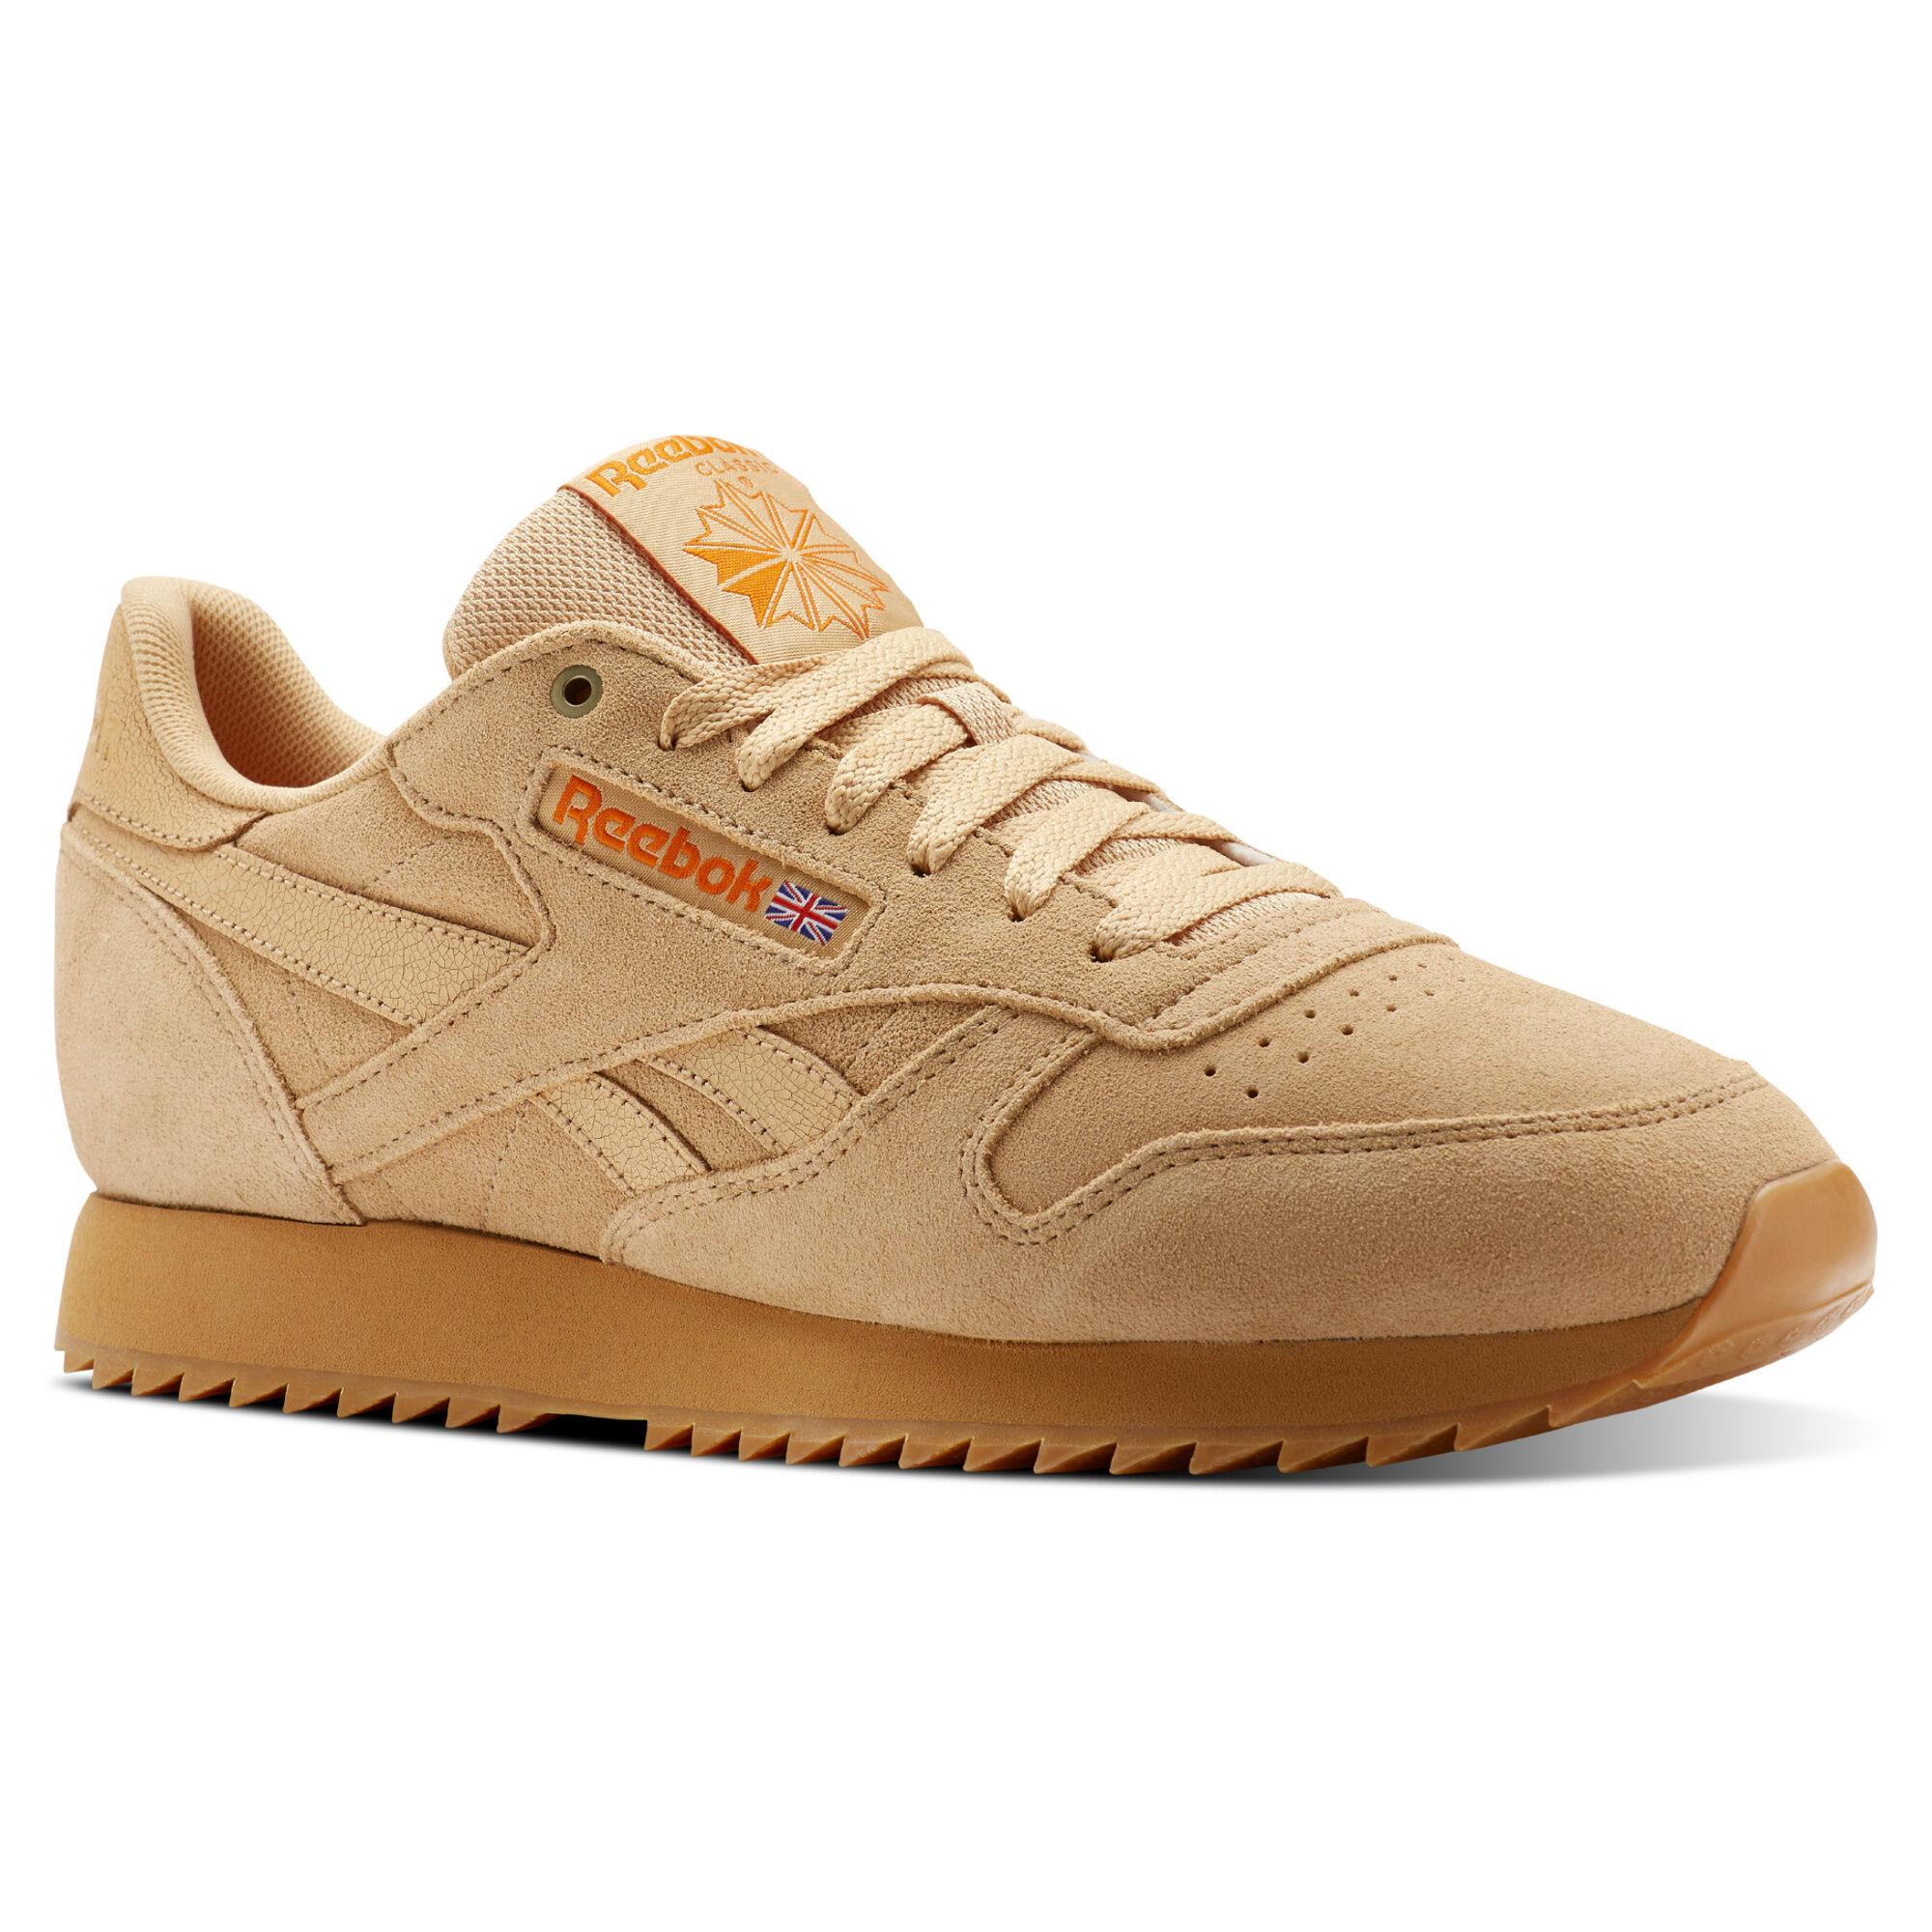 Men Brown Classics Trainers Shoes | Reebok GR